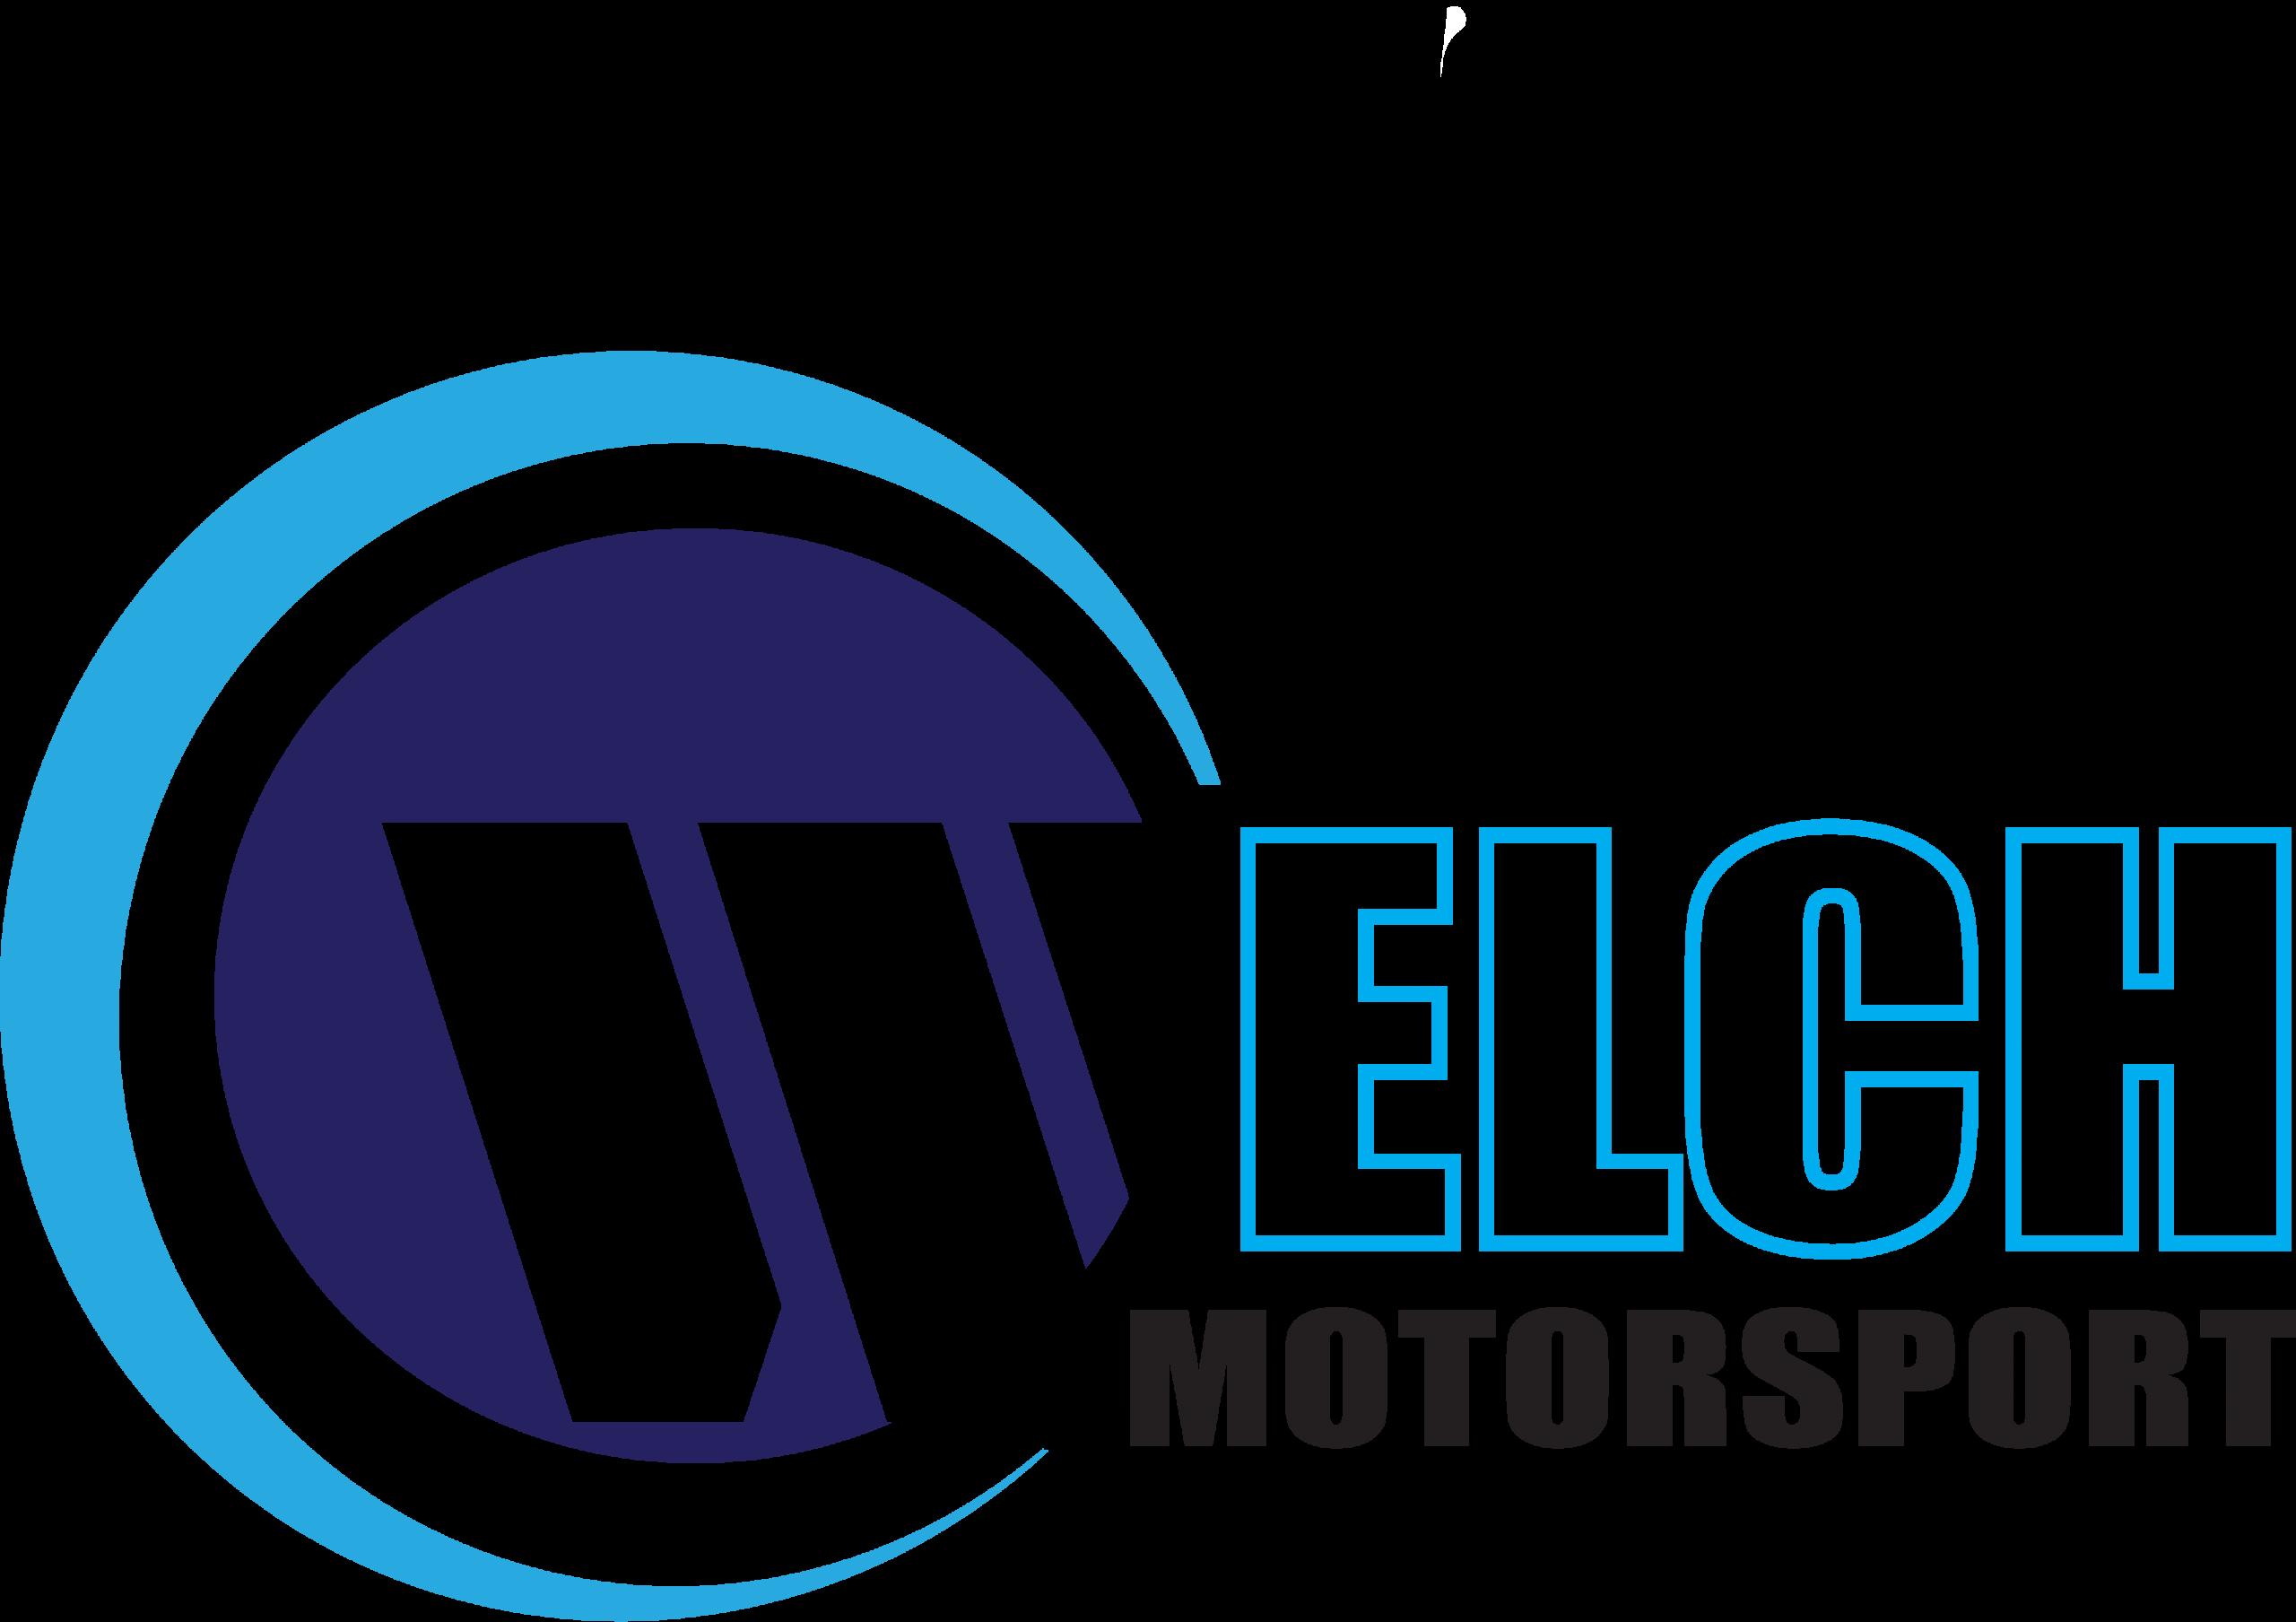 welchmotorsport.com